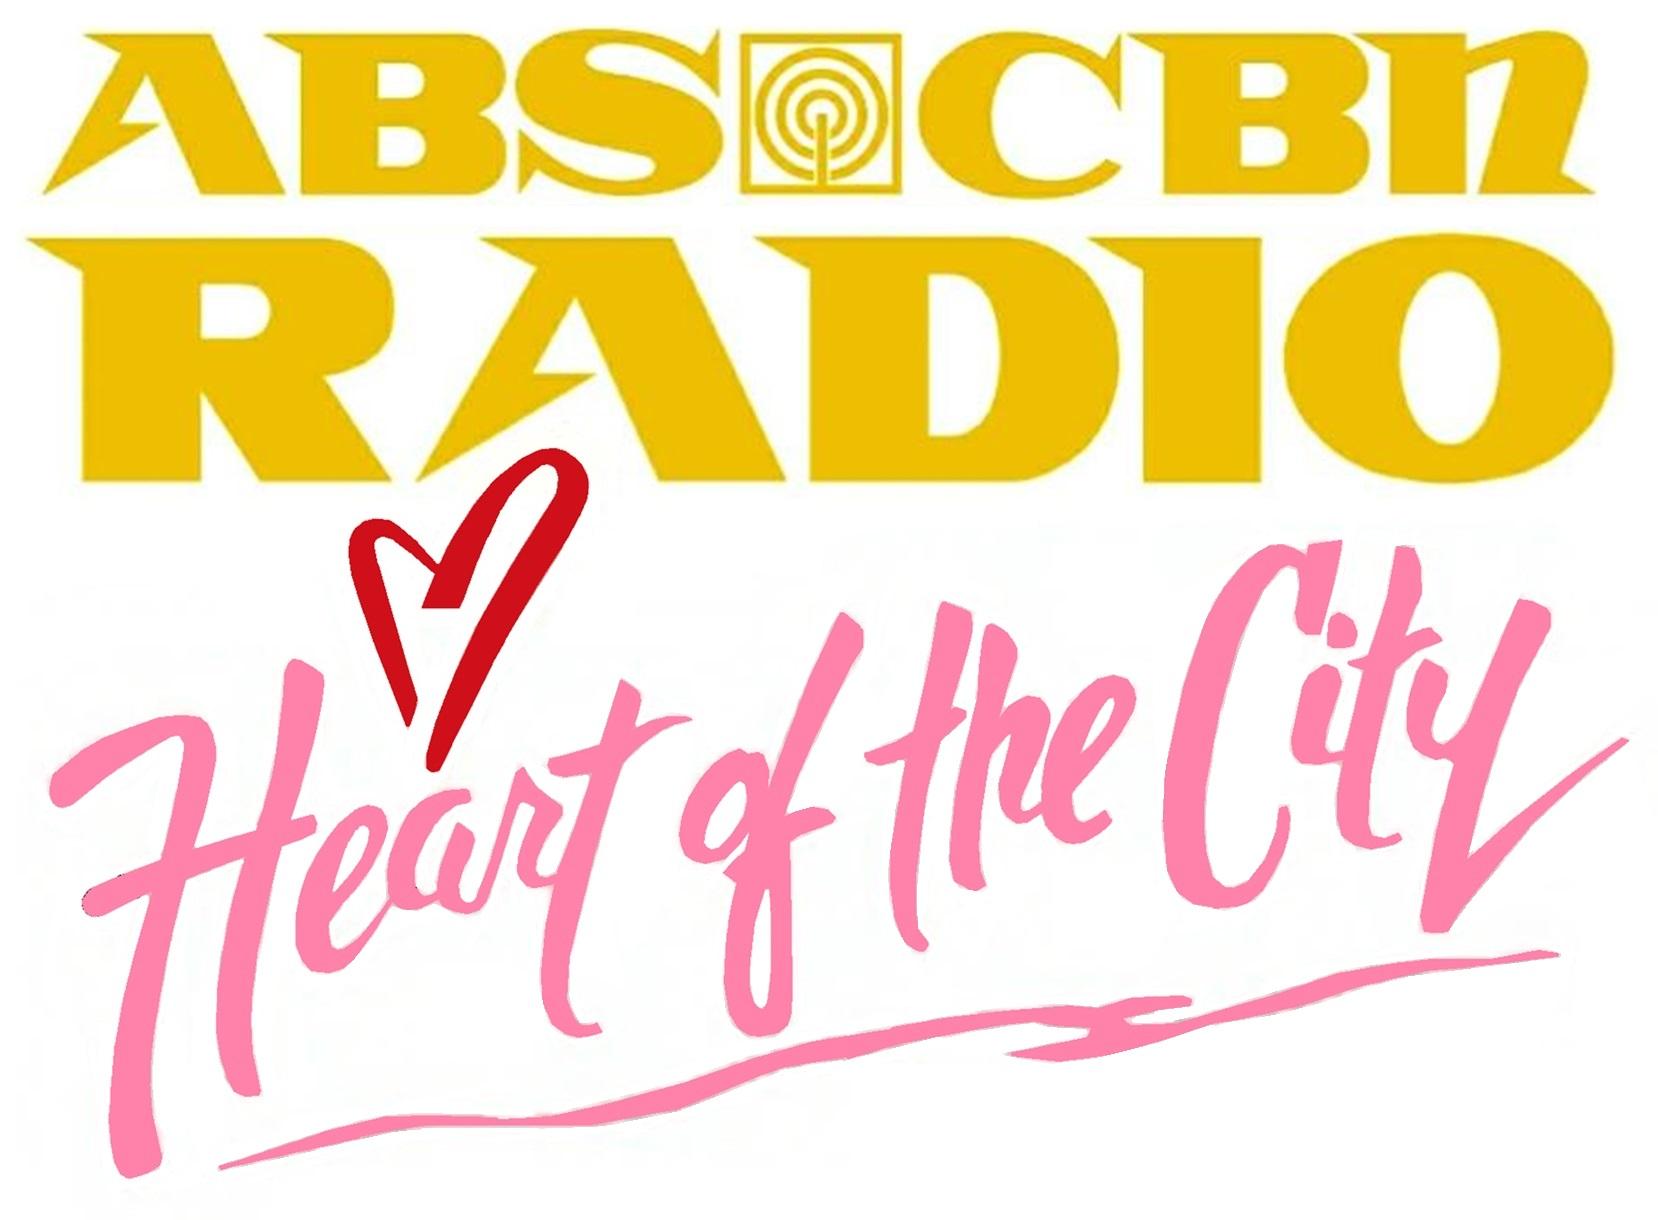 ABS-CBN Radio